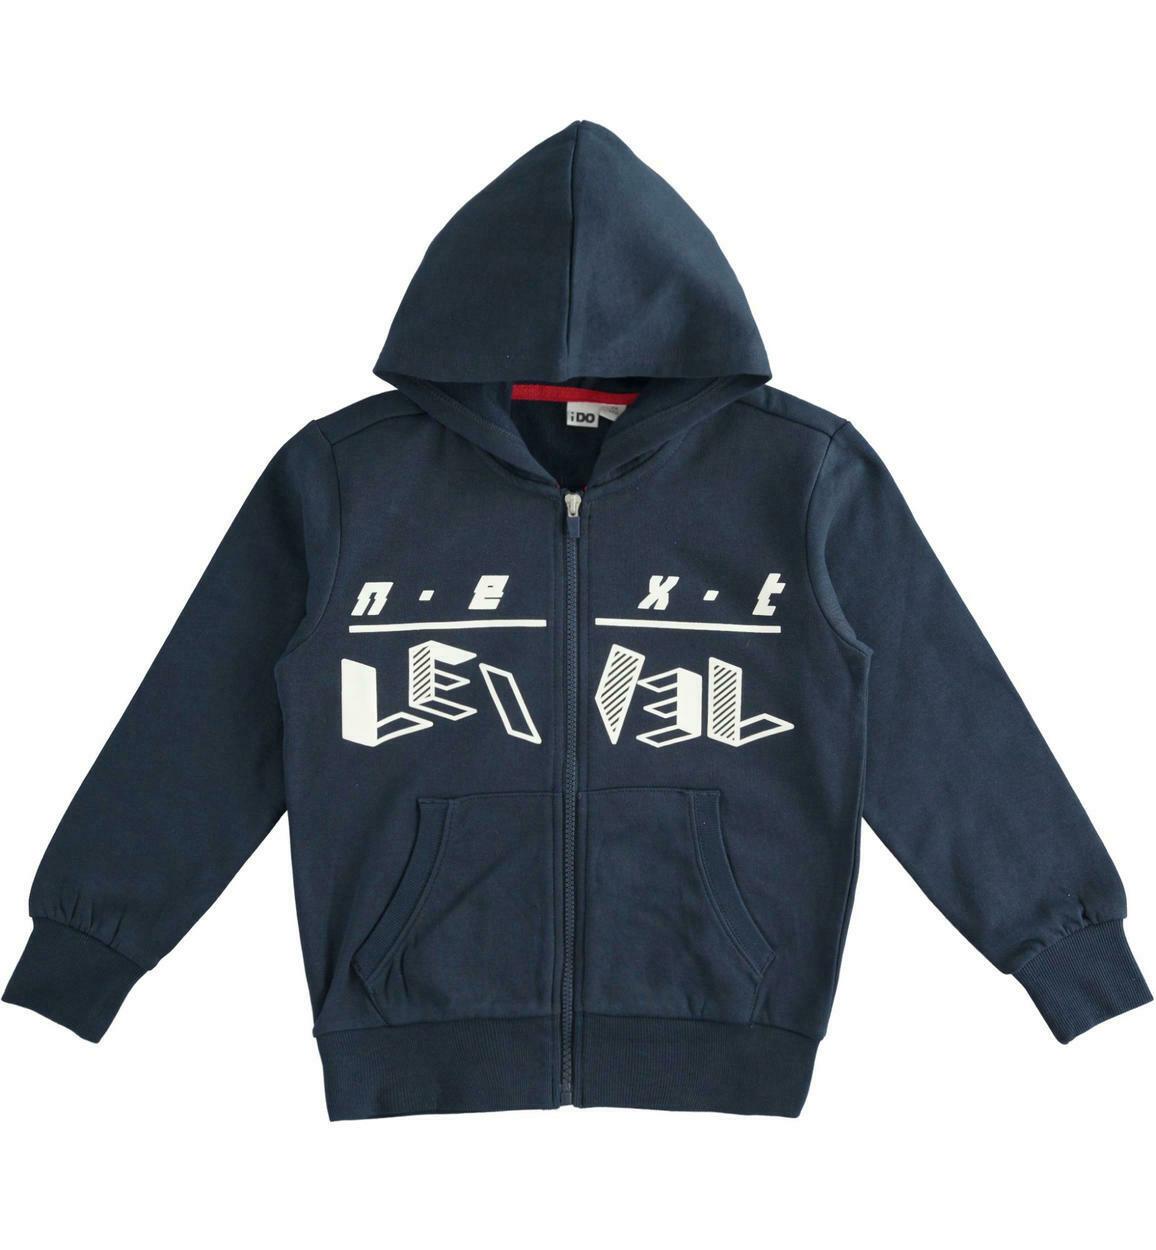 iDo Boys full zip Navy Hood sweatshirt